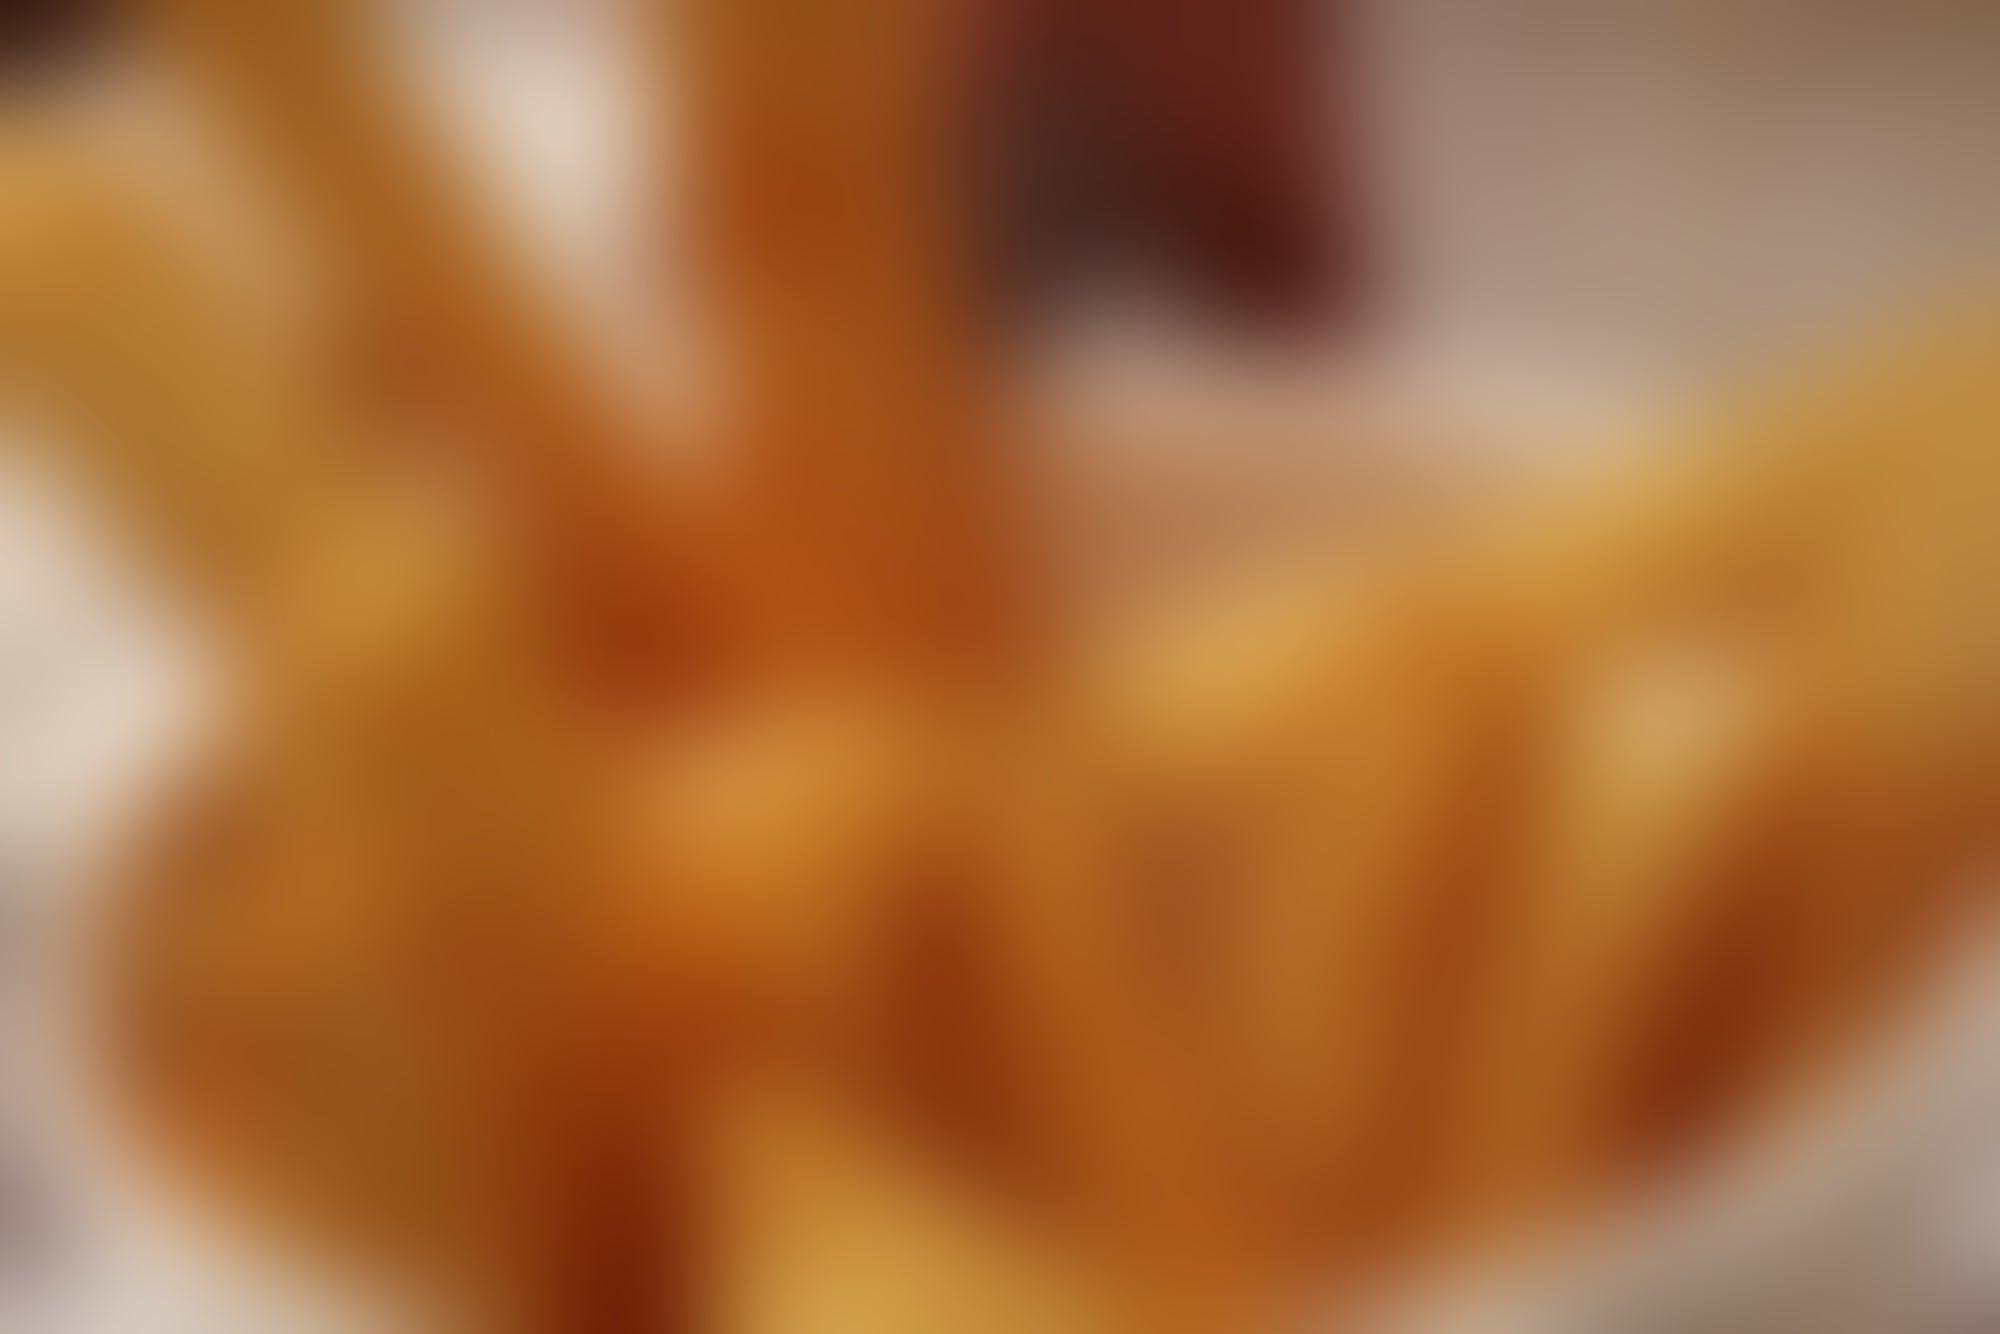 National Restaurant Association Sues New York City Over Sodium Warnings on Menus